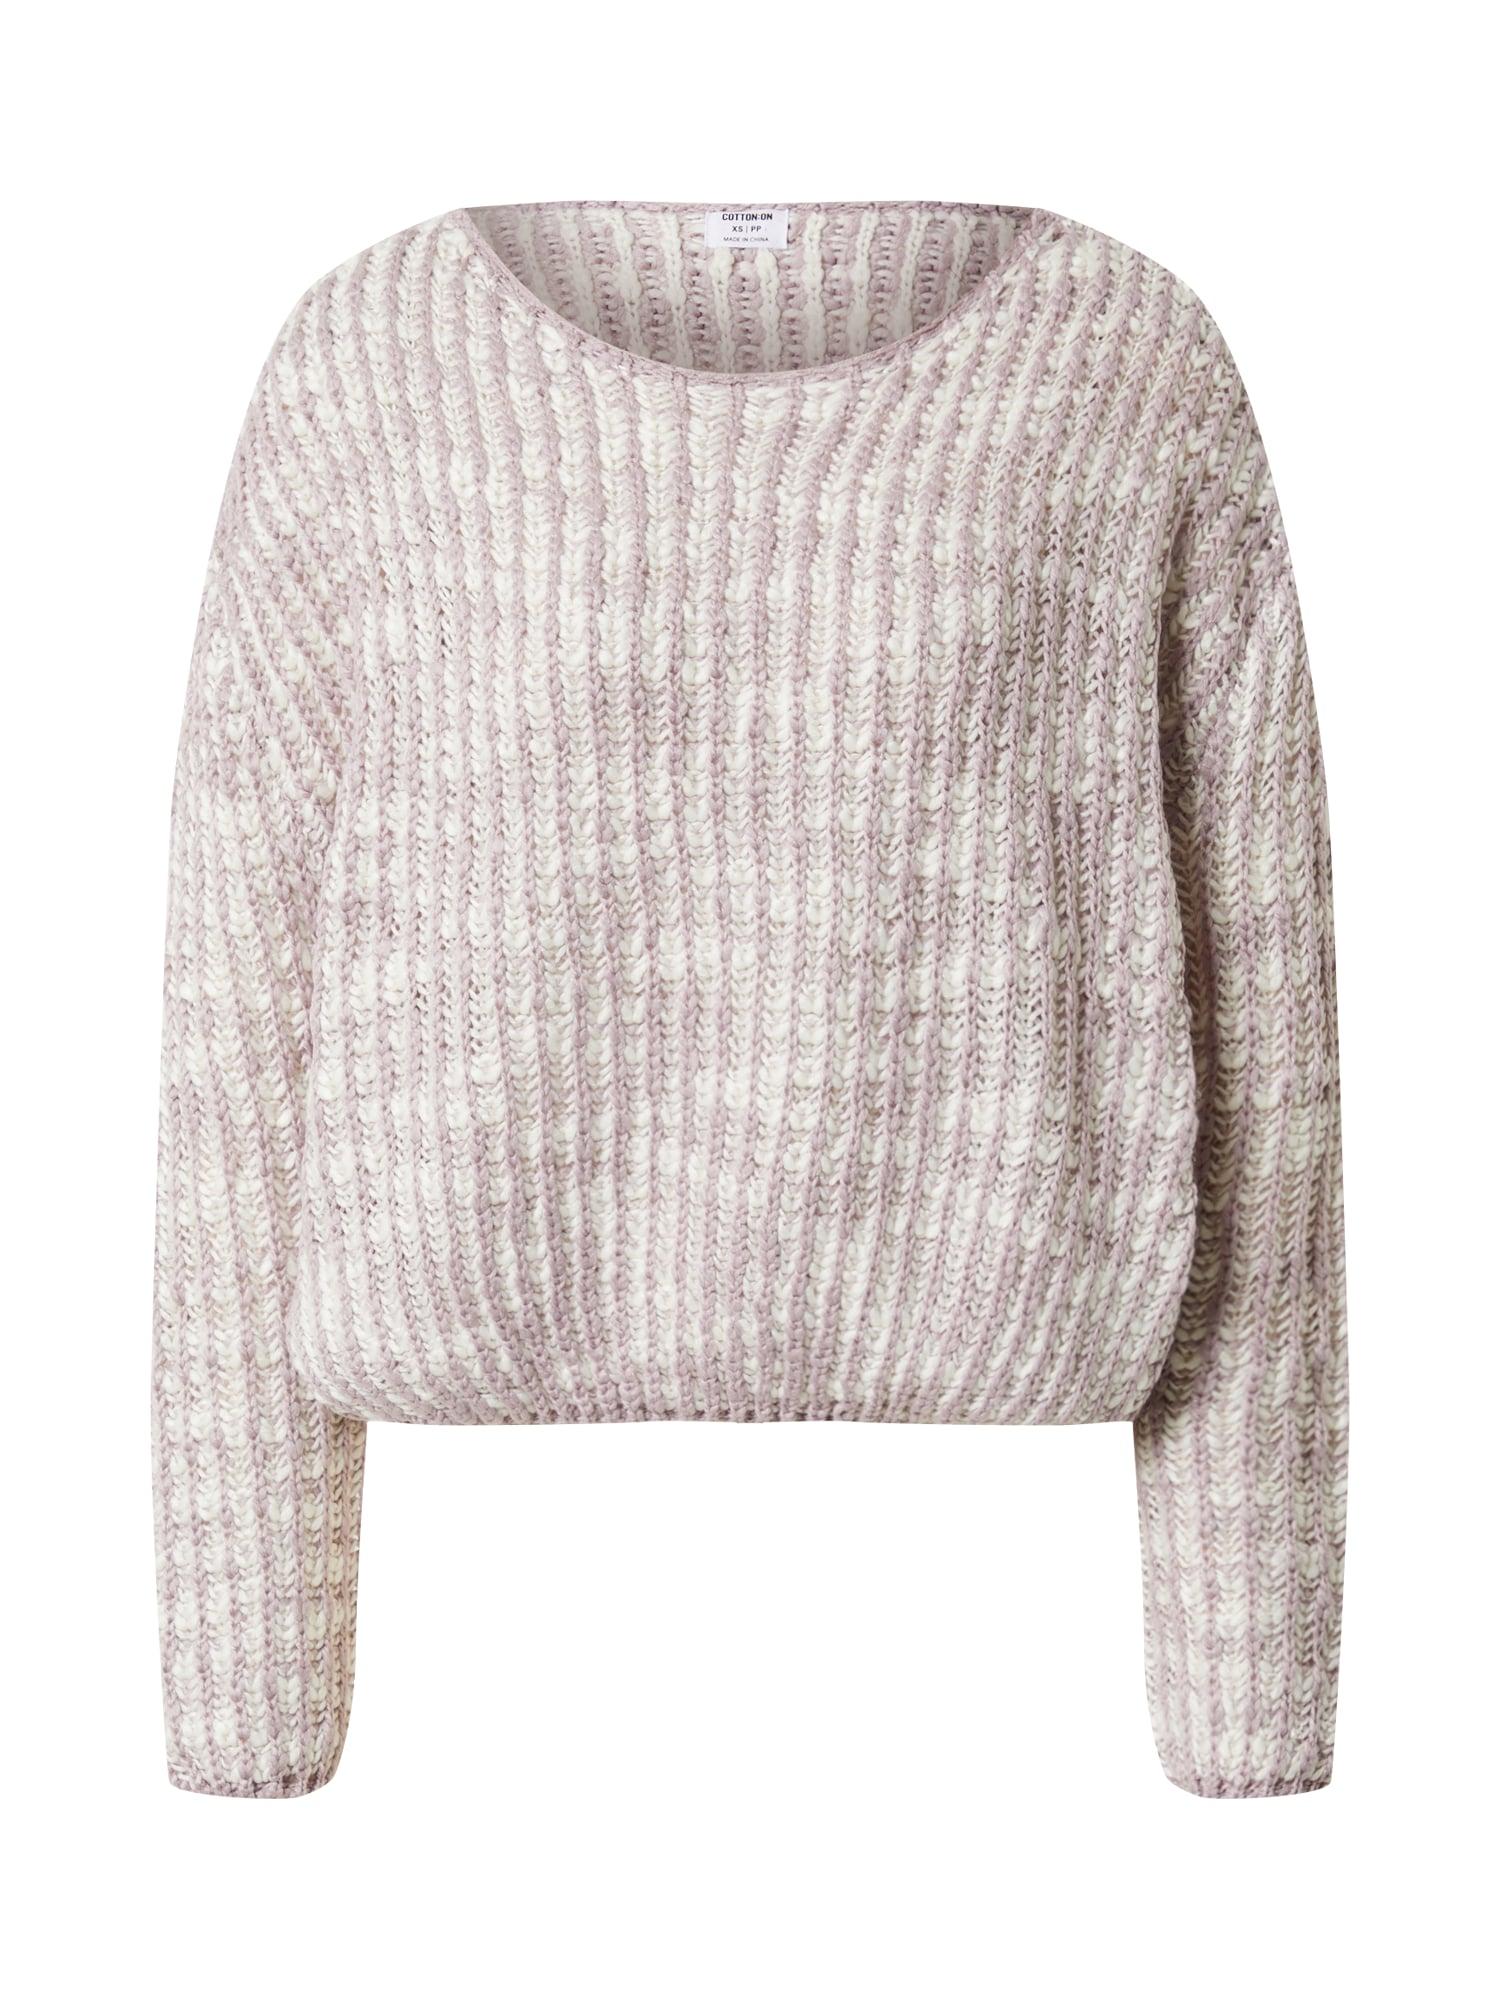 Cotton On Sveter 'THE LICORICE ALLSORT'  šedobiela / fialová